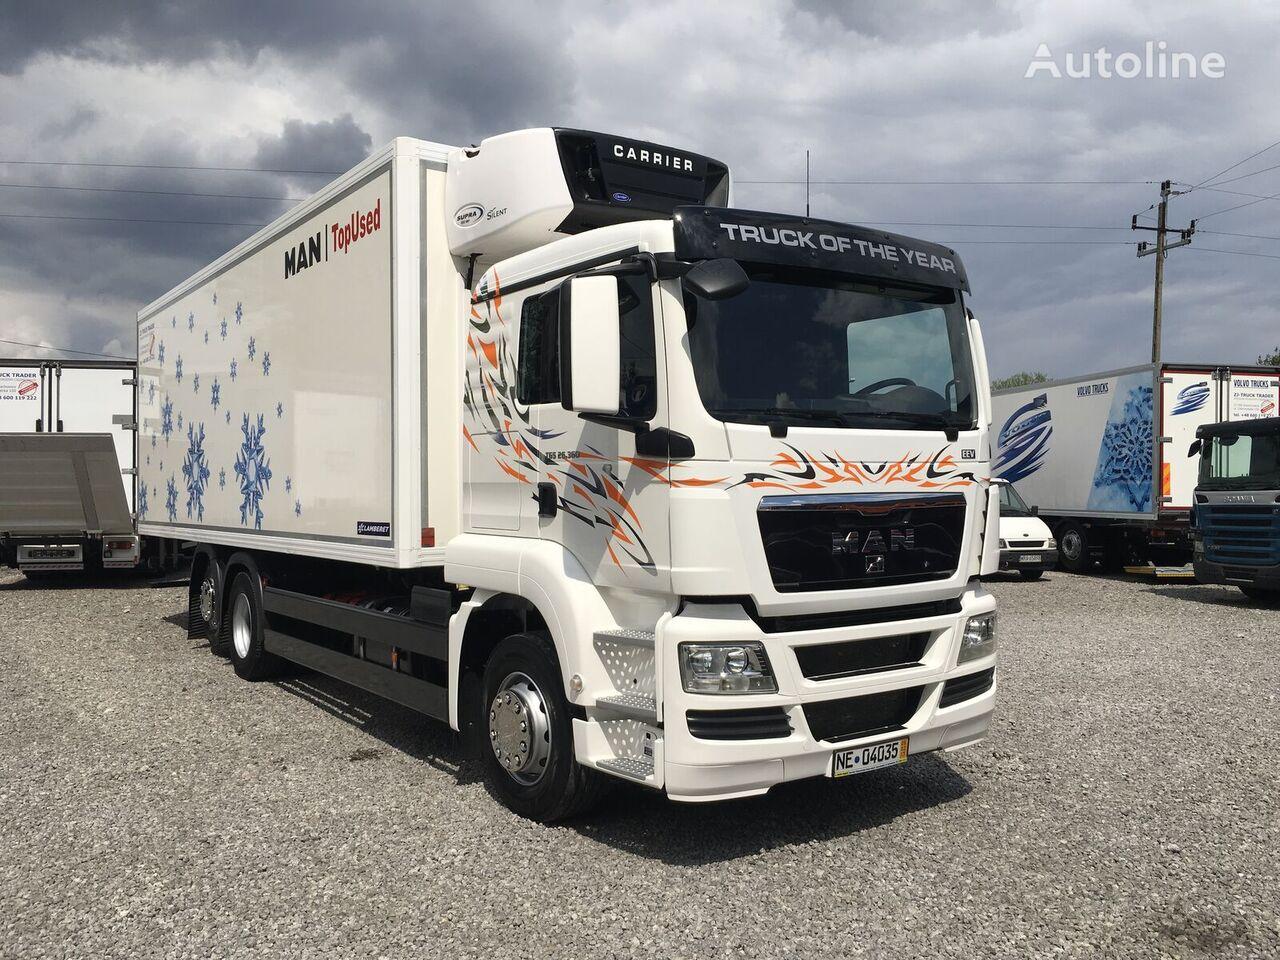 MAN TGX TGS 26.360 6x2 Multitemperatura , Super Stan ! refrigerated truck